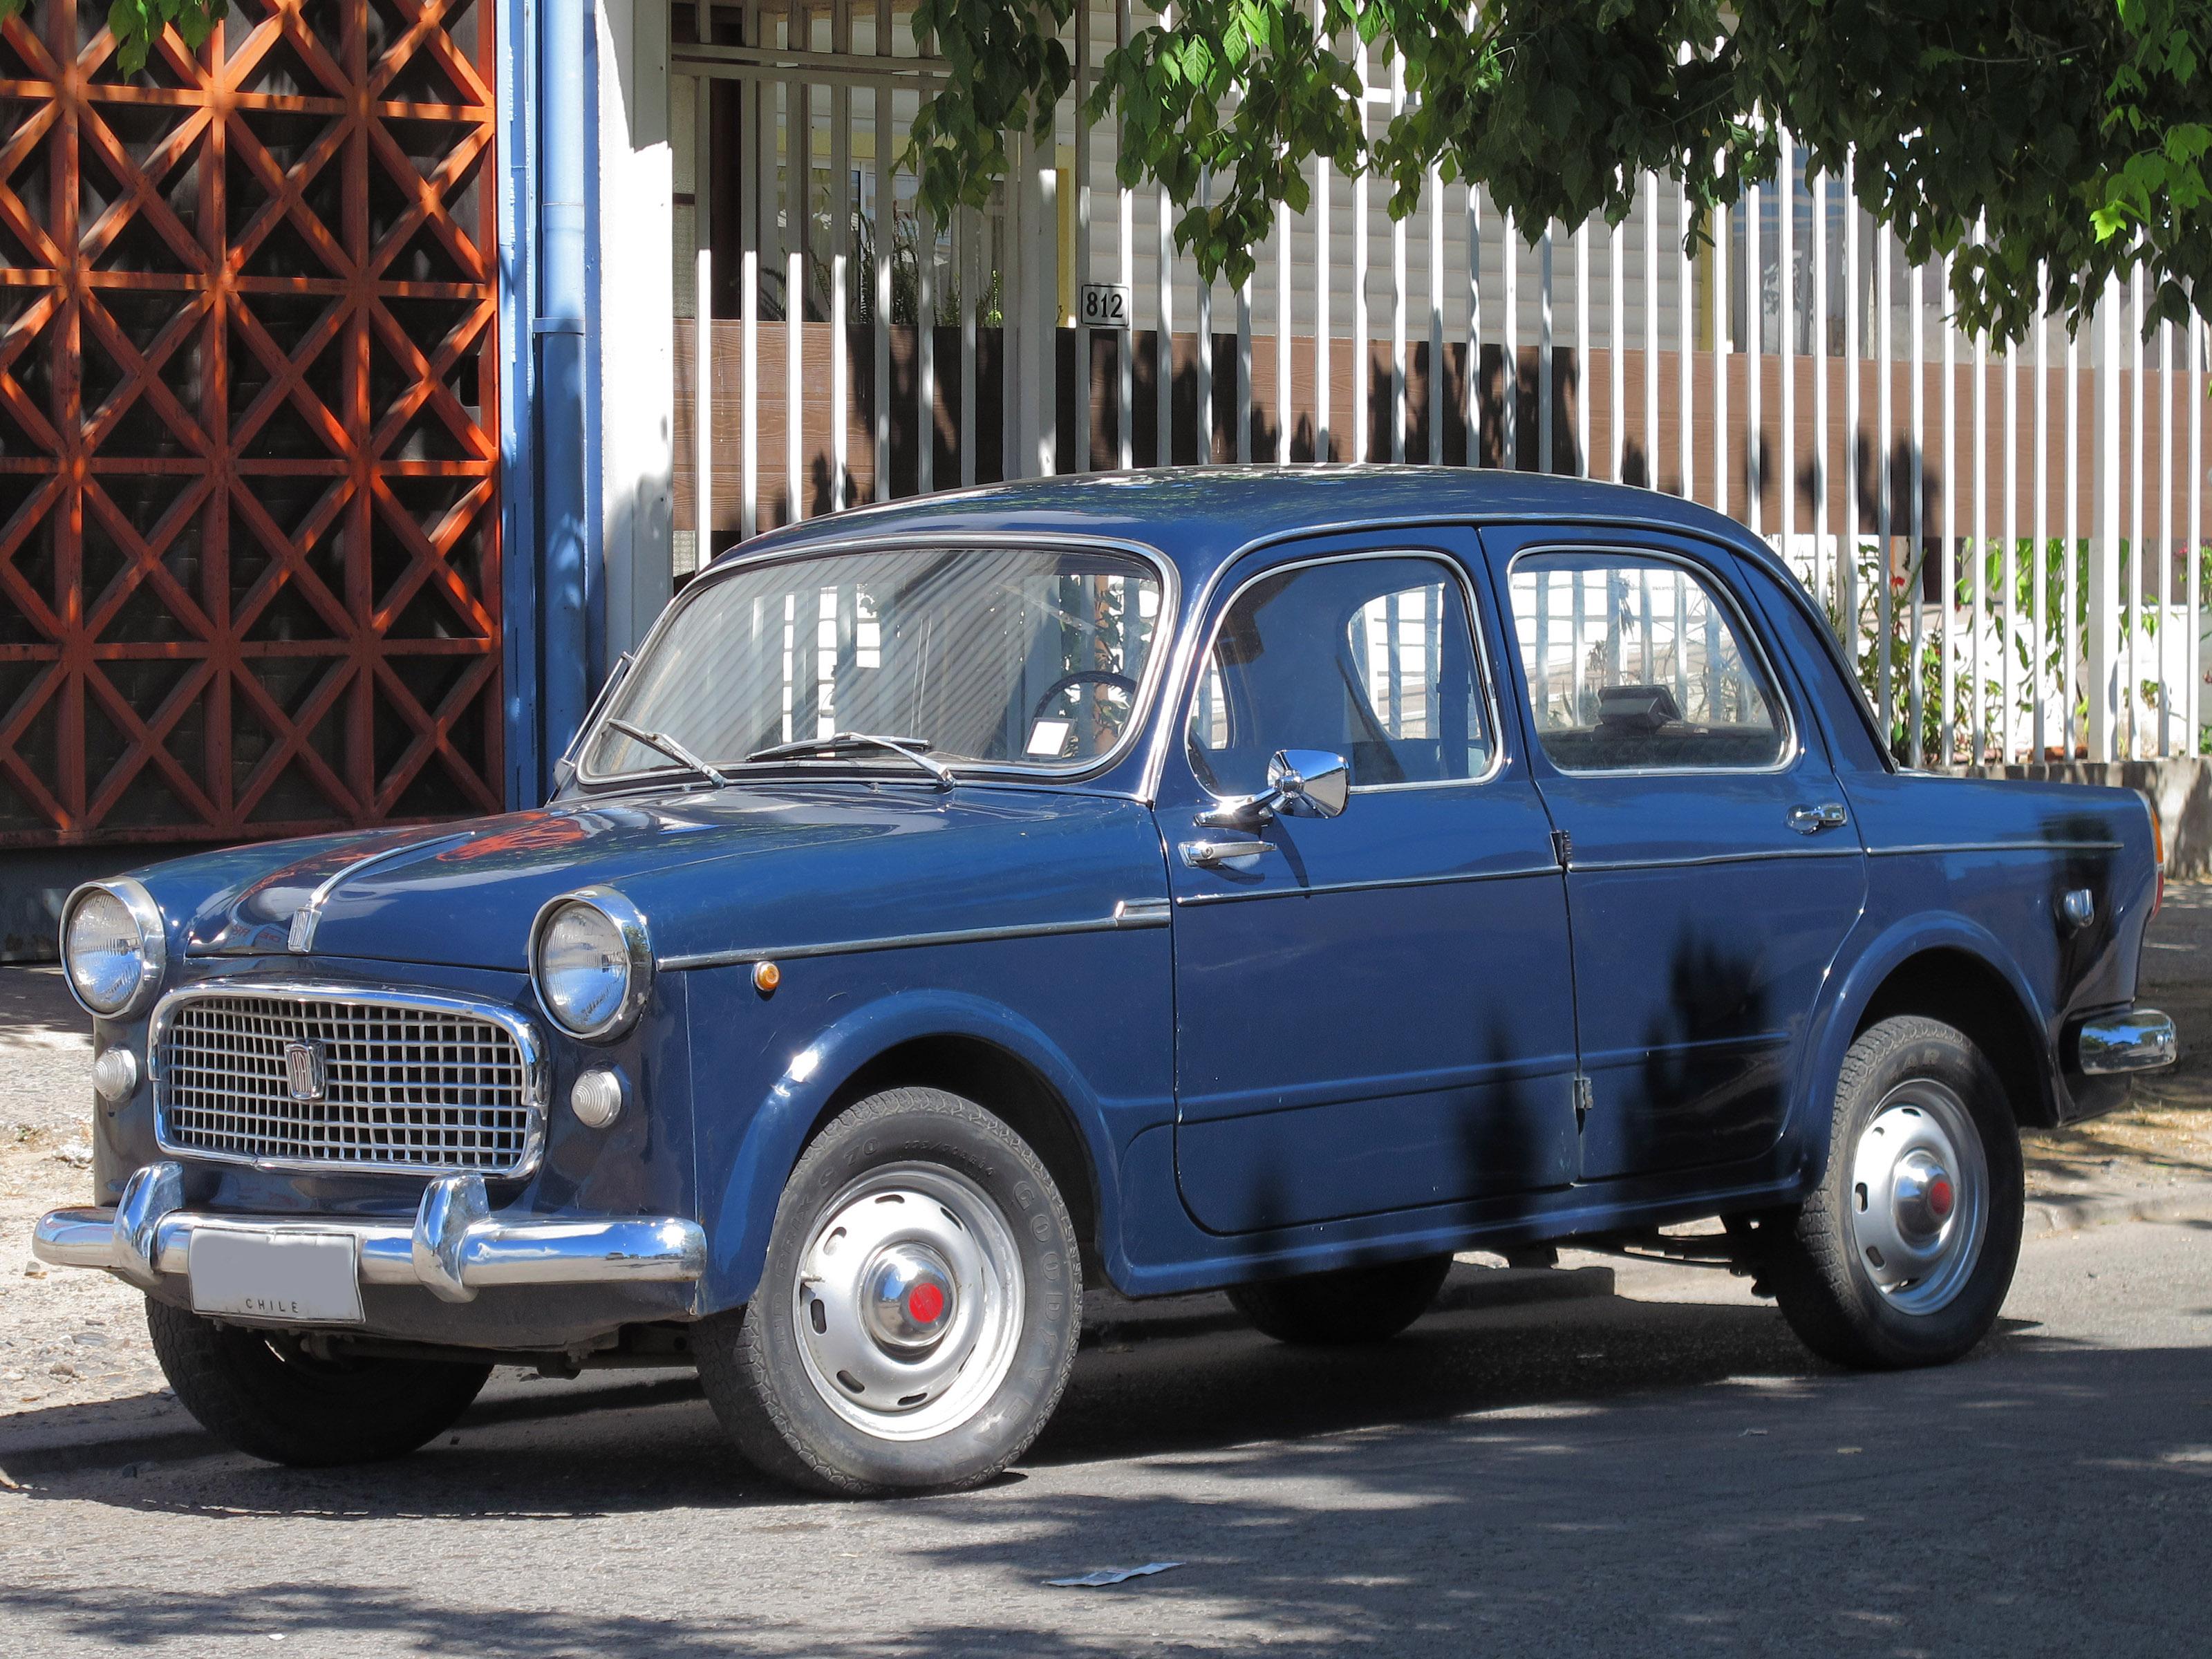 File:Fiat 1100 1960 (15702255043).jpg - Wikimedia Commons